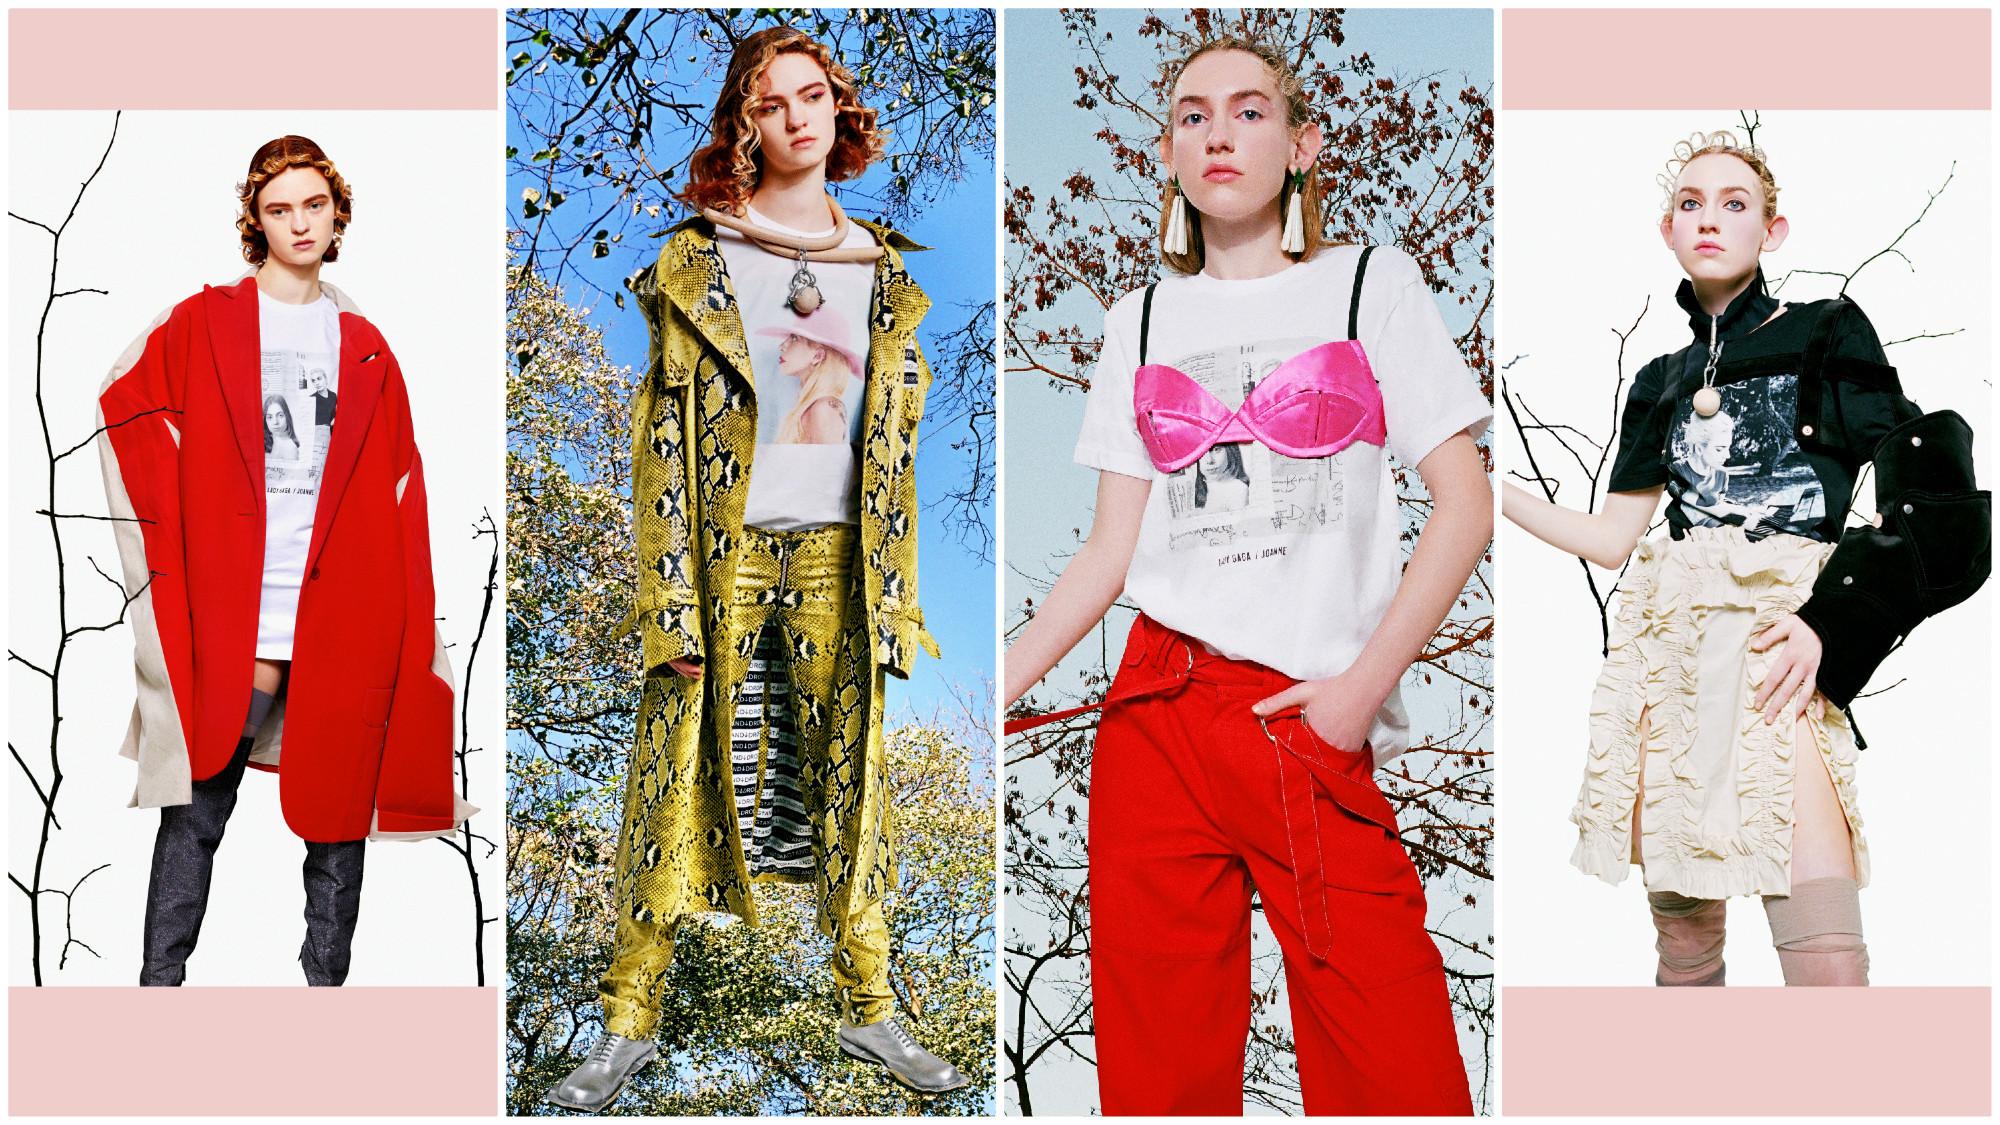 Lady Gaga Joanne Merchandising